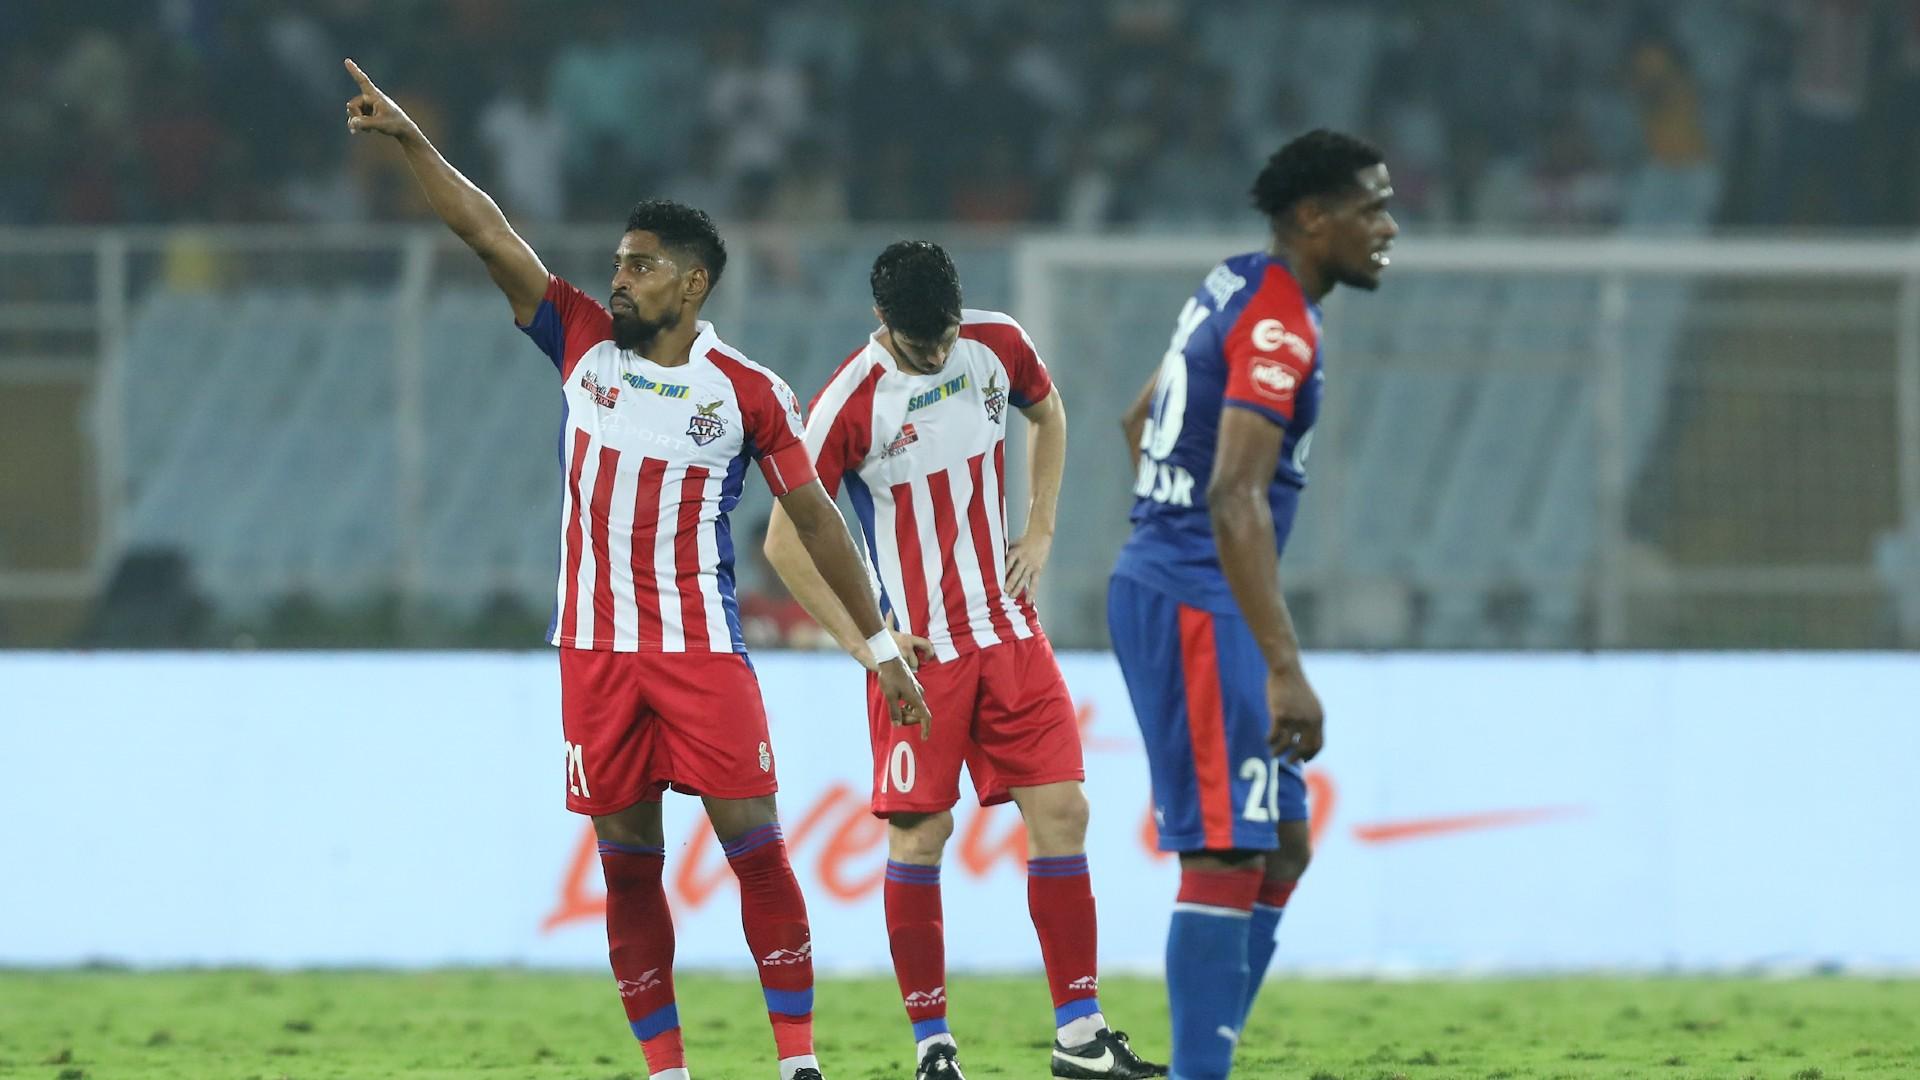 ATK vs Bengaluru FC